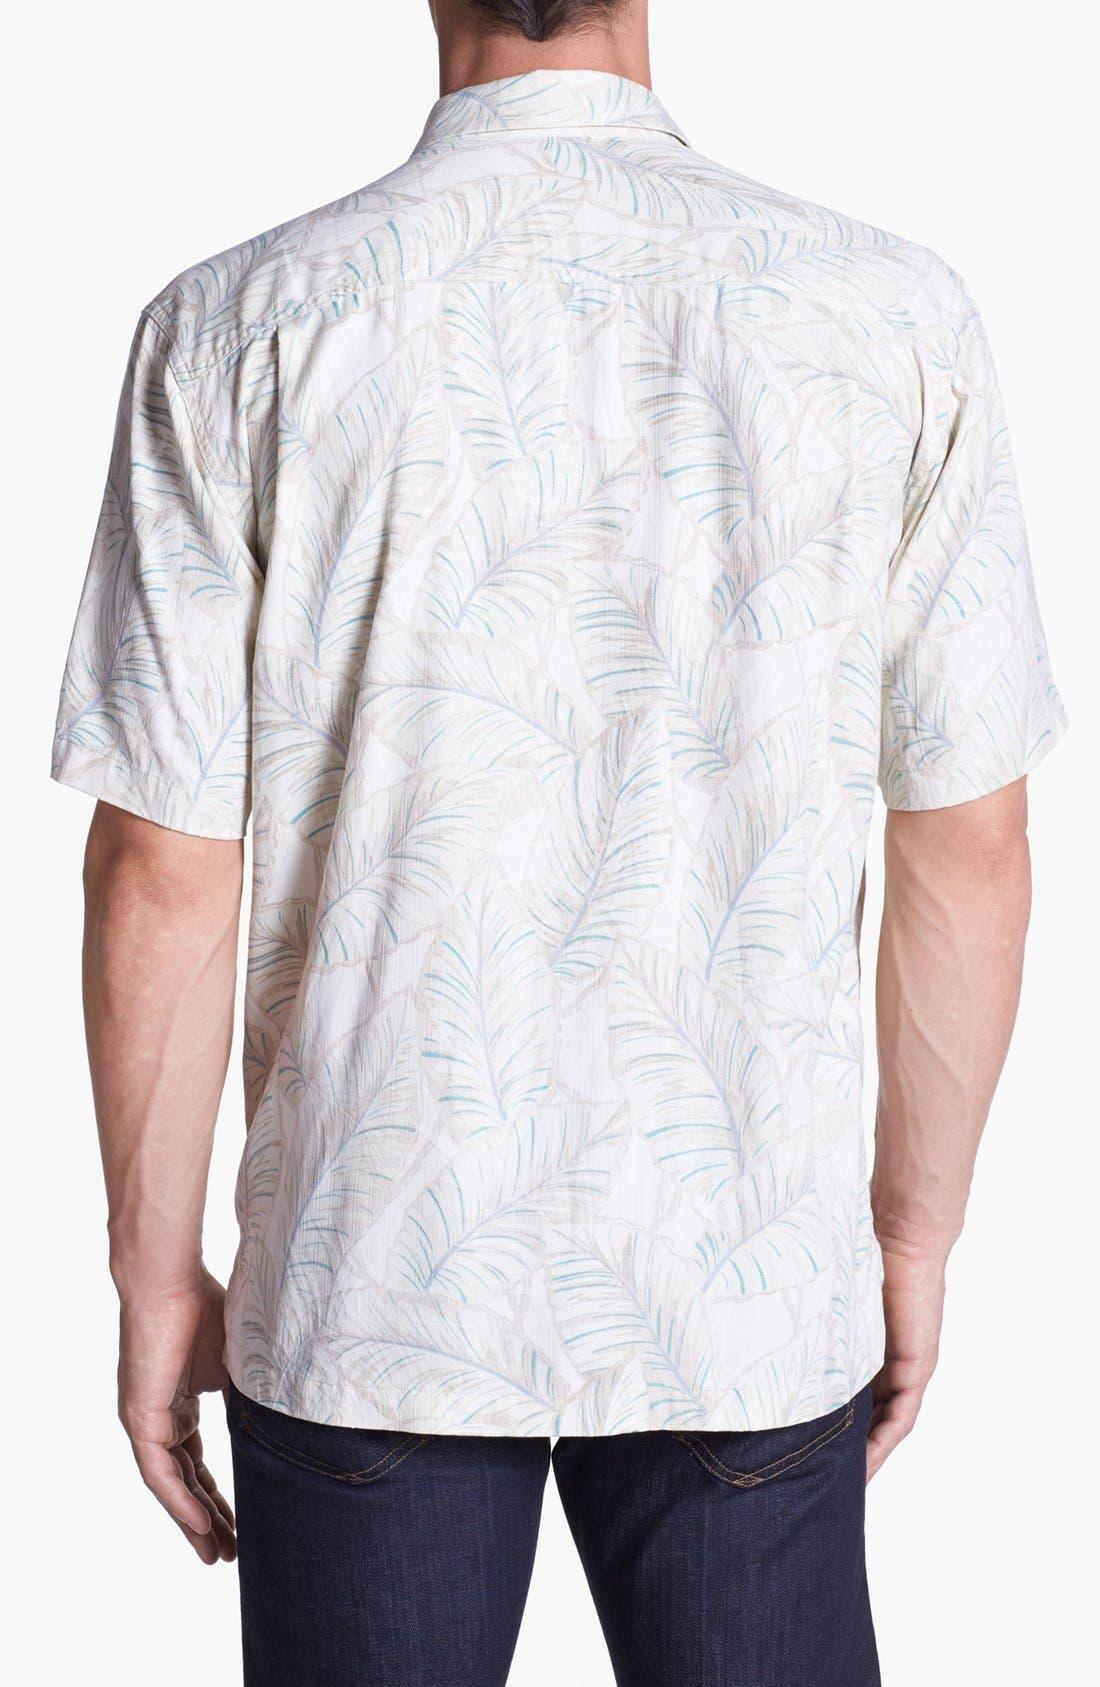 Alternate Image 2  - Tommy Bahama 'Leaves of Arabia' Silk Campshirt